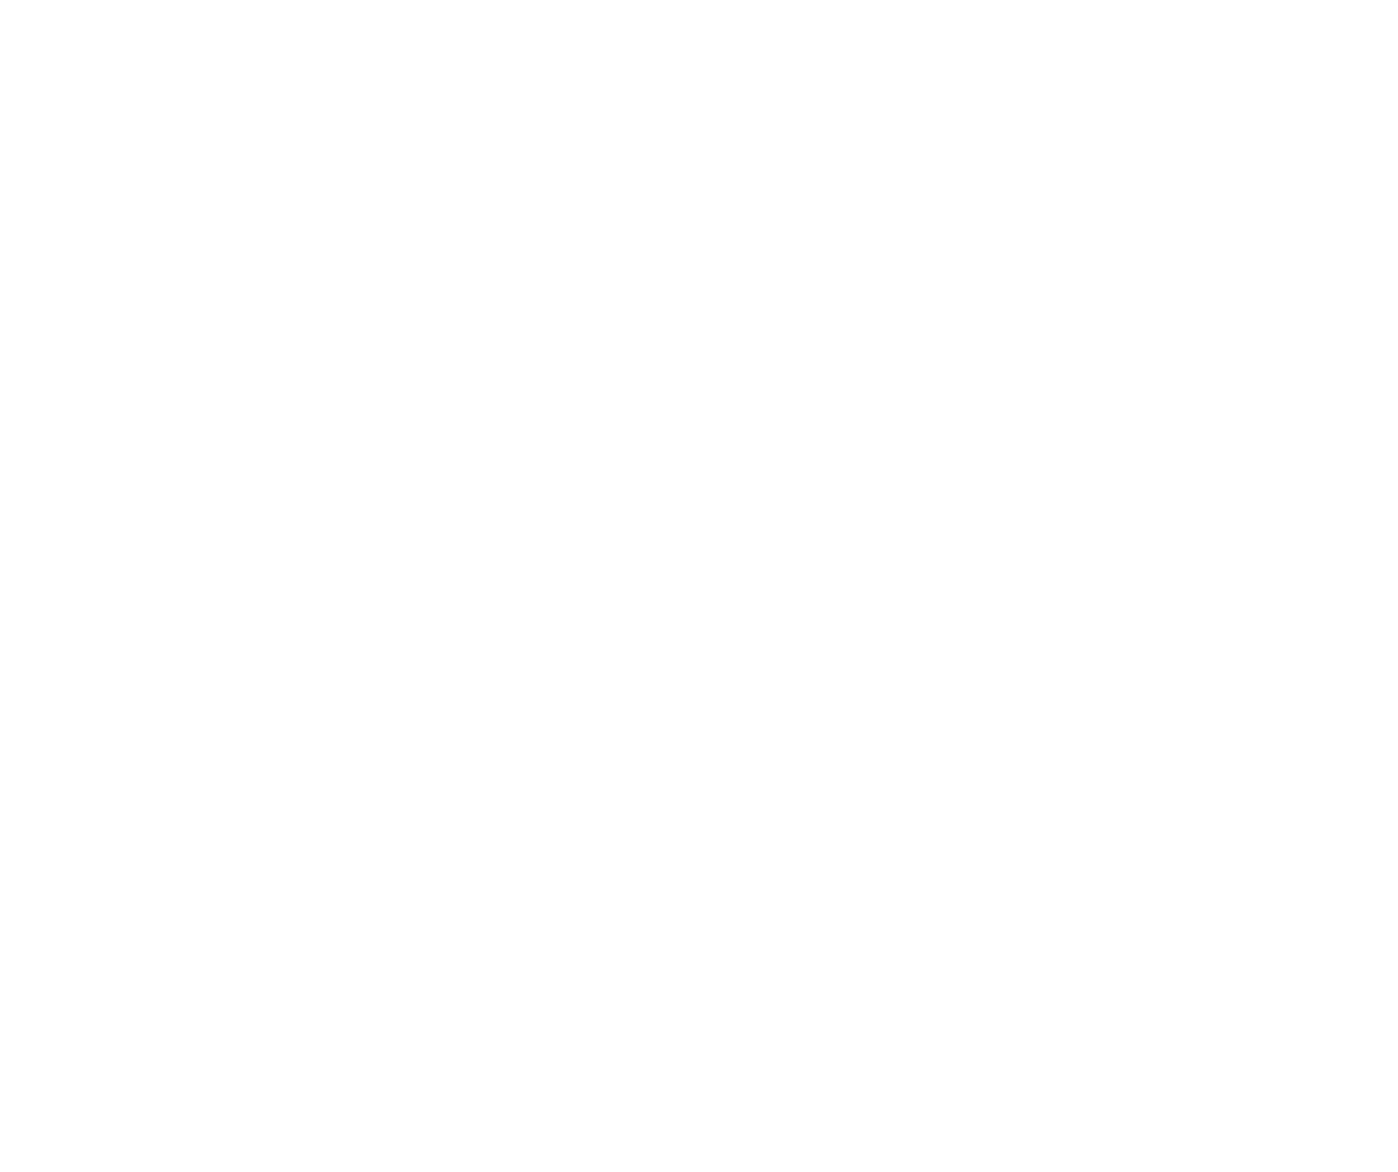 WB TELEVISION